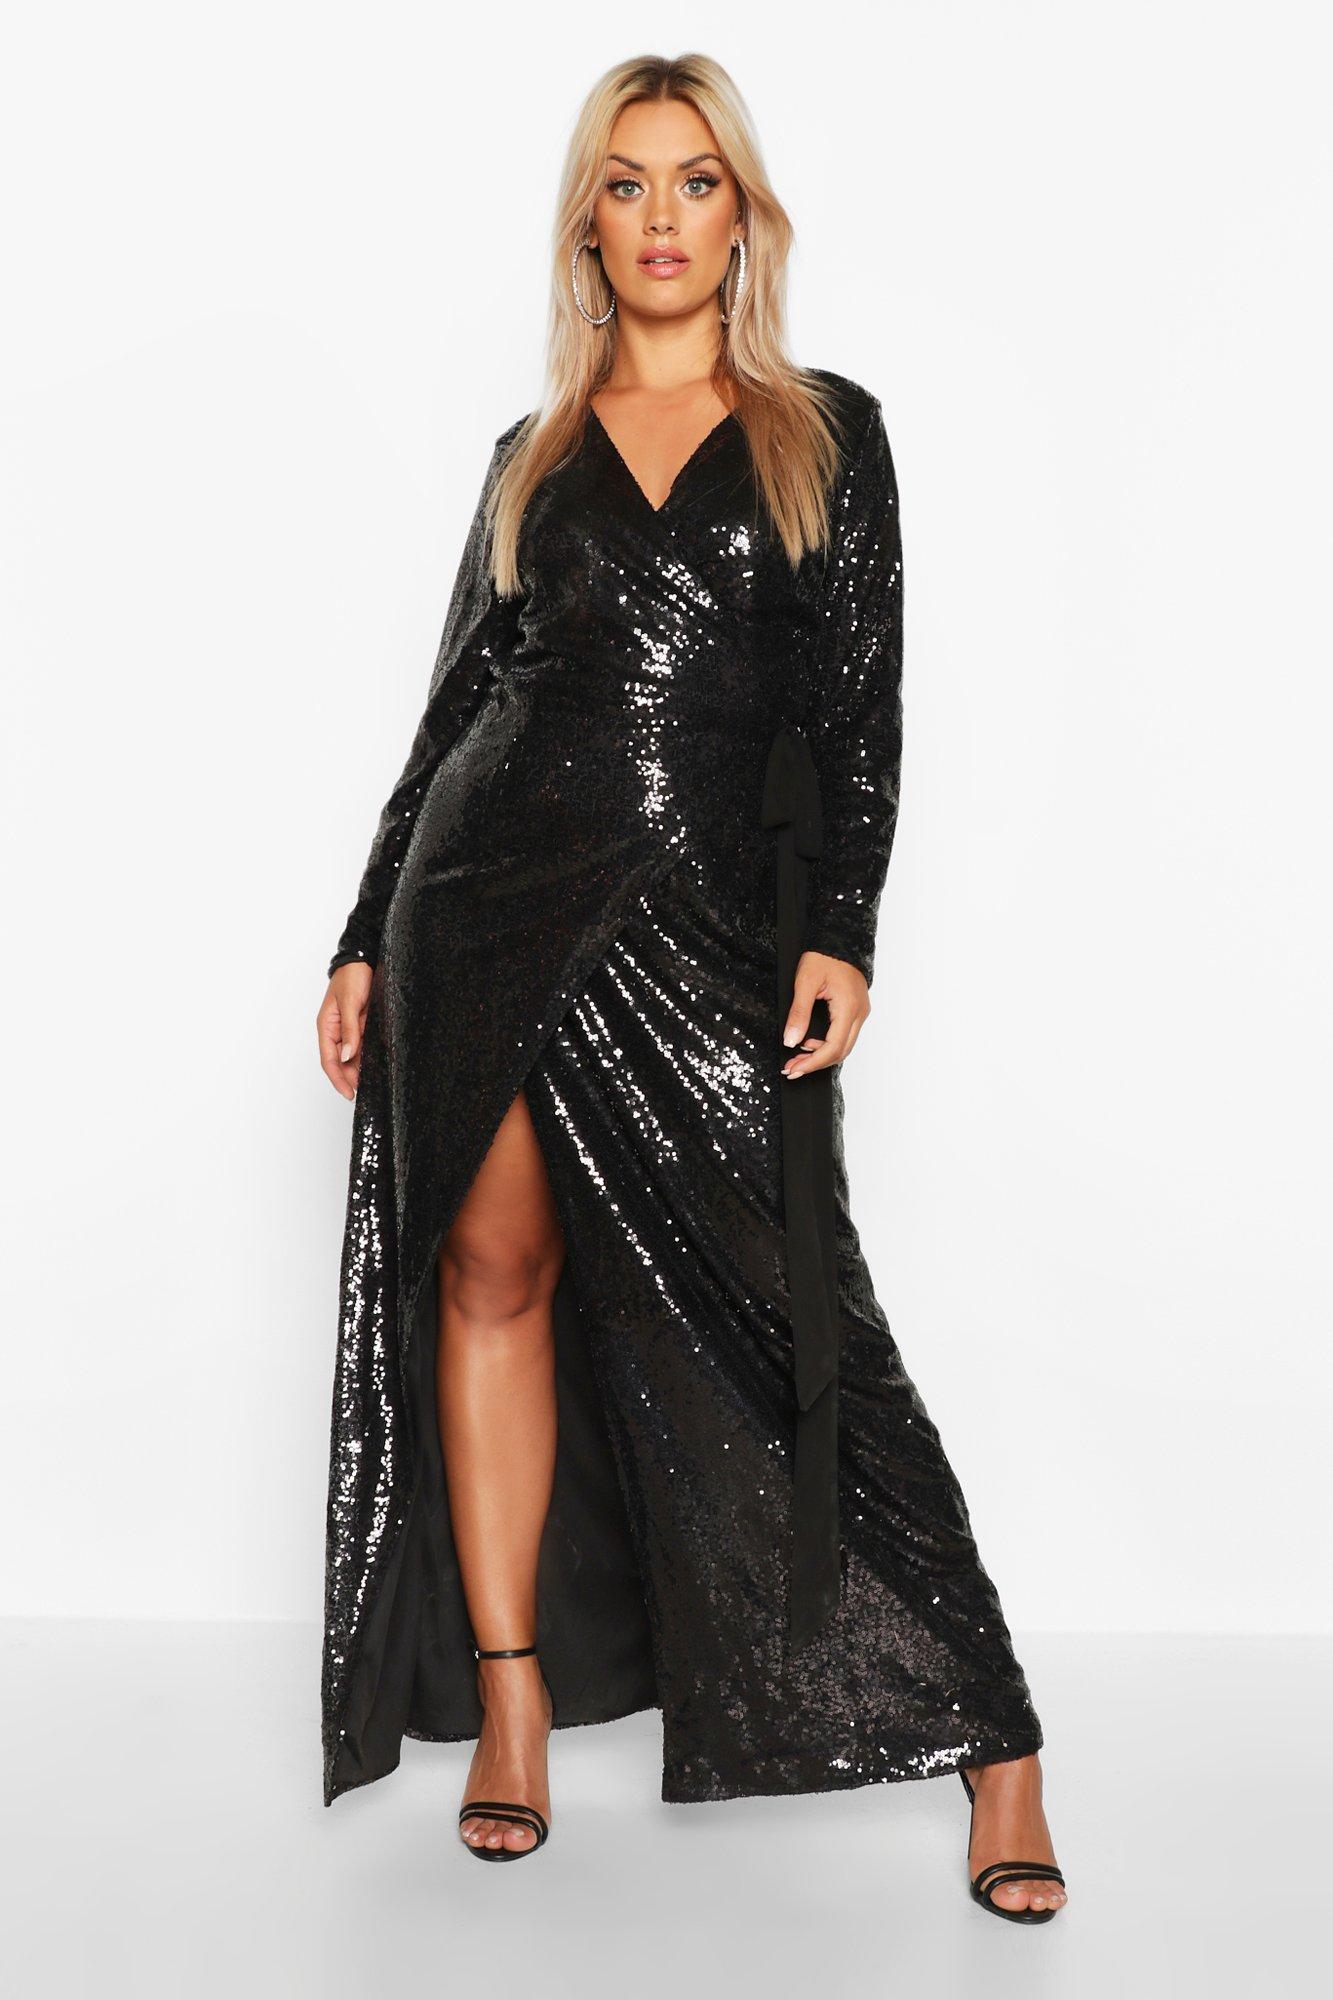 60s 70s Plus Size Dresses, Clothing, Costumes Womens Plus Sequin Wrap Floor Sweeping Maxi Dress - Black - 16 $30.40 AT vintagedancer.com